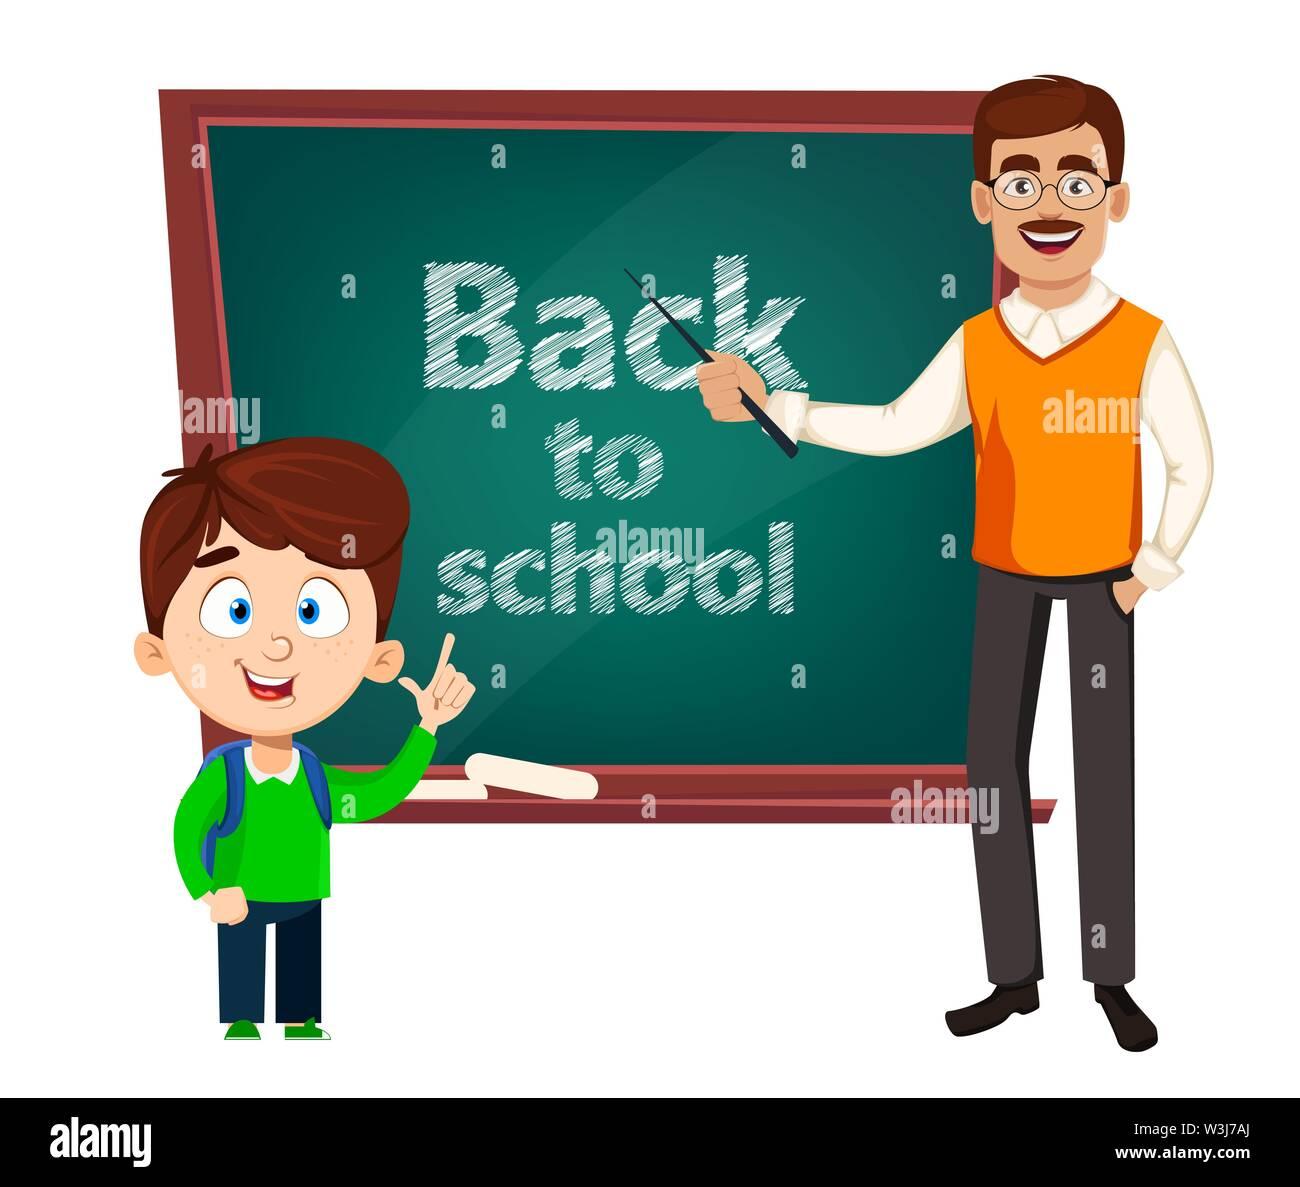 Back to school. Teacher man cartoon character and cute schoolboy. Teacher's day. Vector illustration - Stock Image